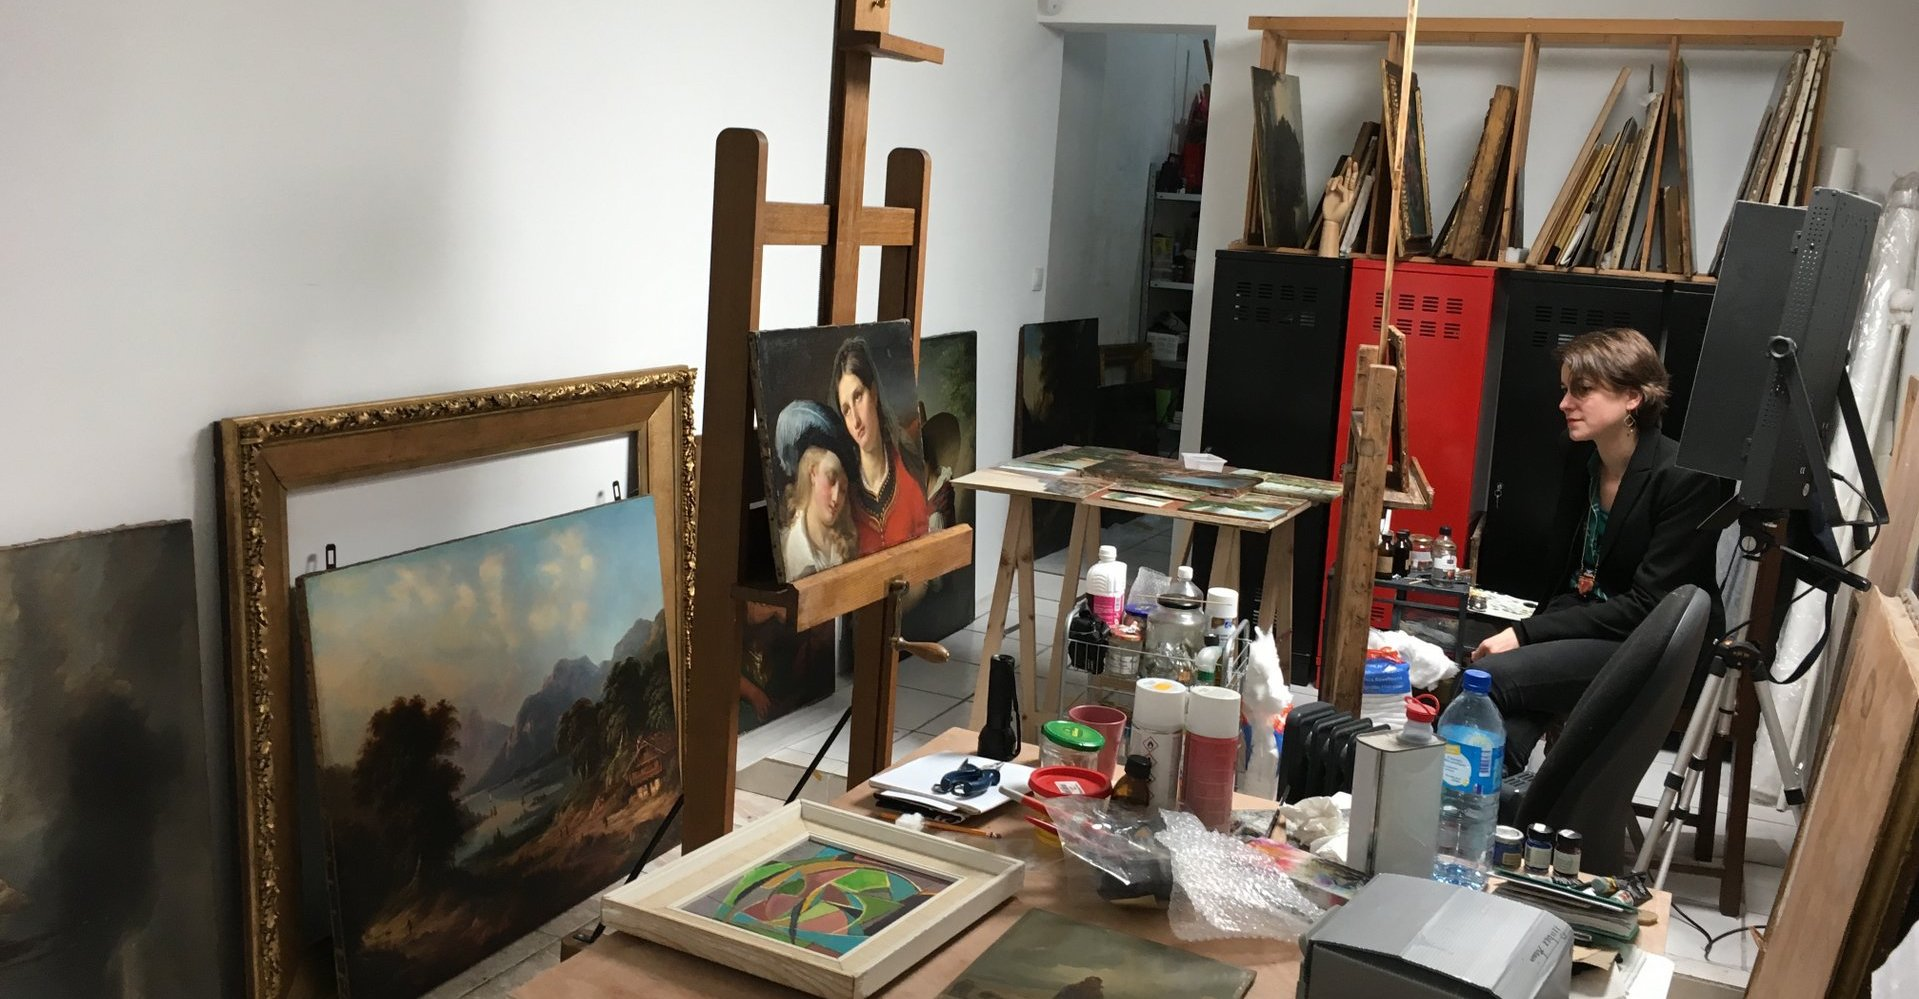 restauration-tableau-peinture-ancien-paris-slider4